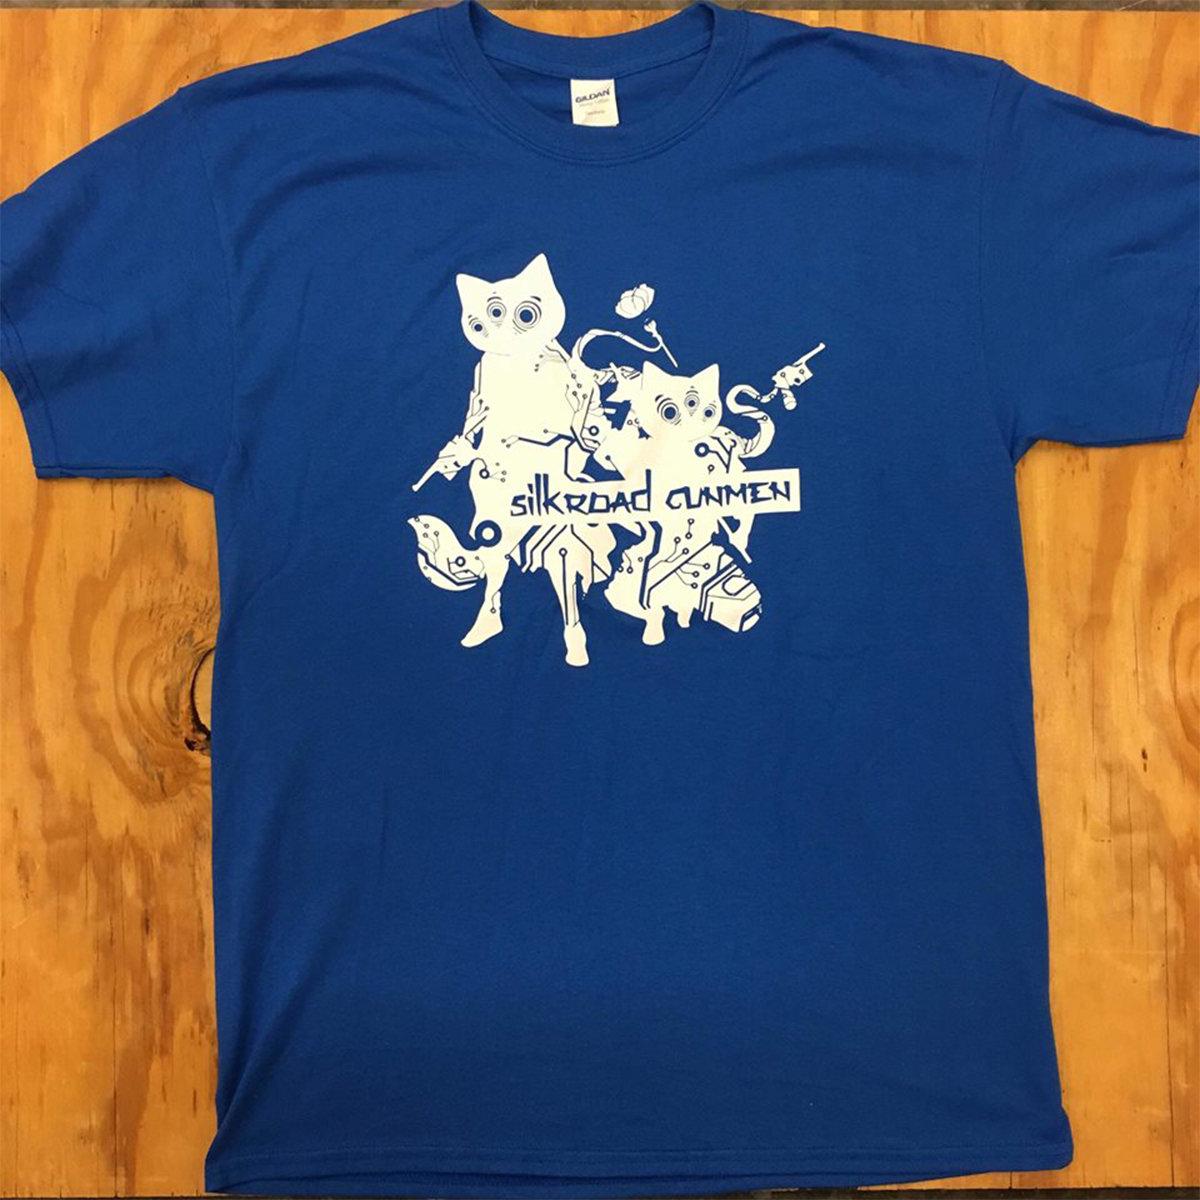 5f92ff73 High Quality Screen printed T-Shirt [ Blue Shirt / White Logo ]